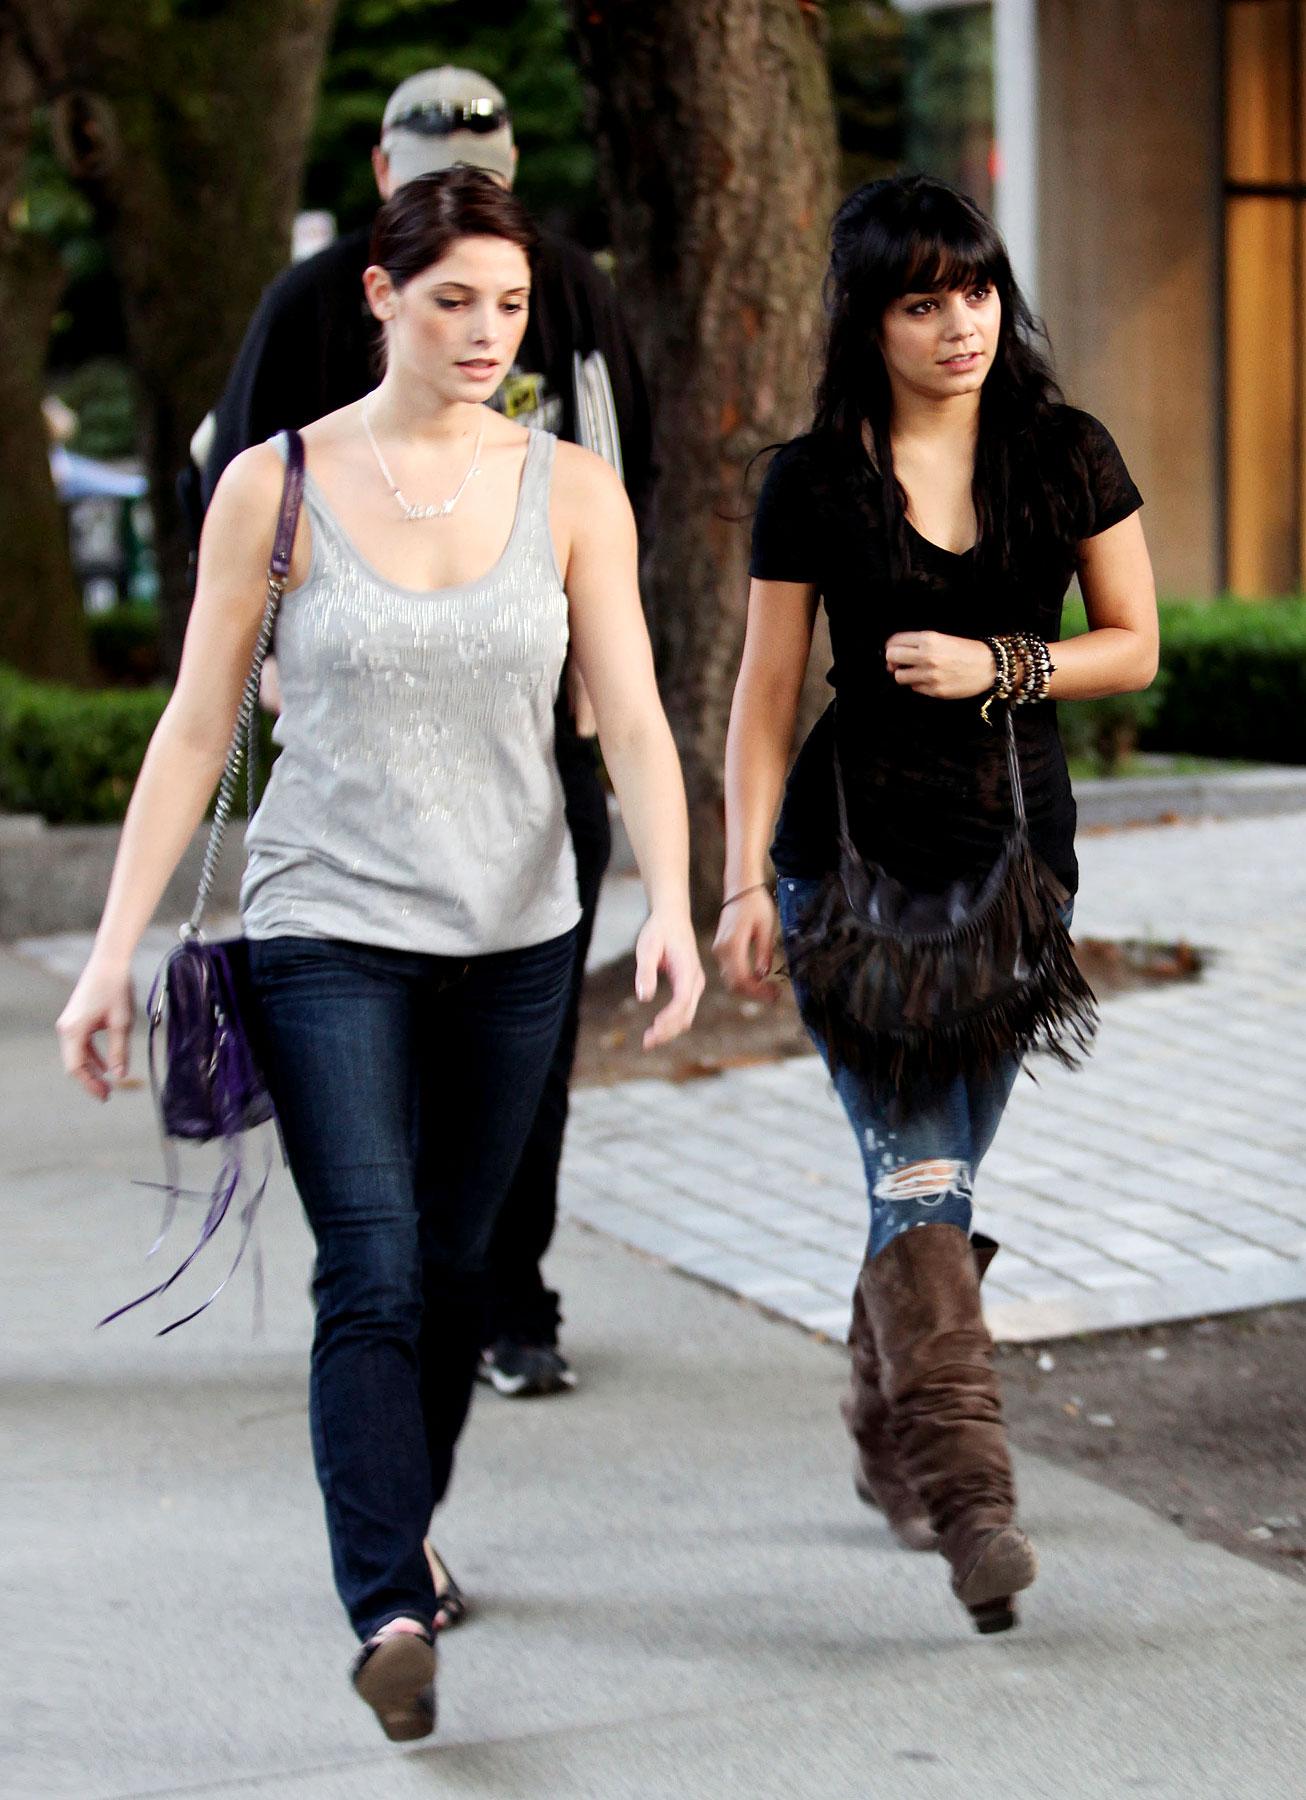 PHOTO GALLERY: Vanessa Hudgens & Ashley Greene's Shopping Date